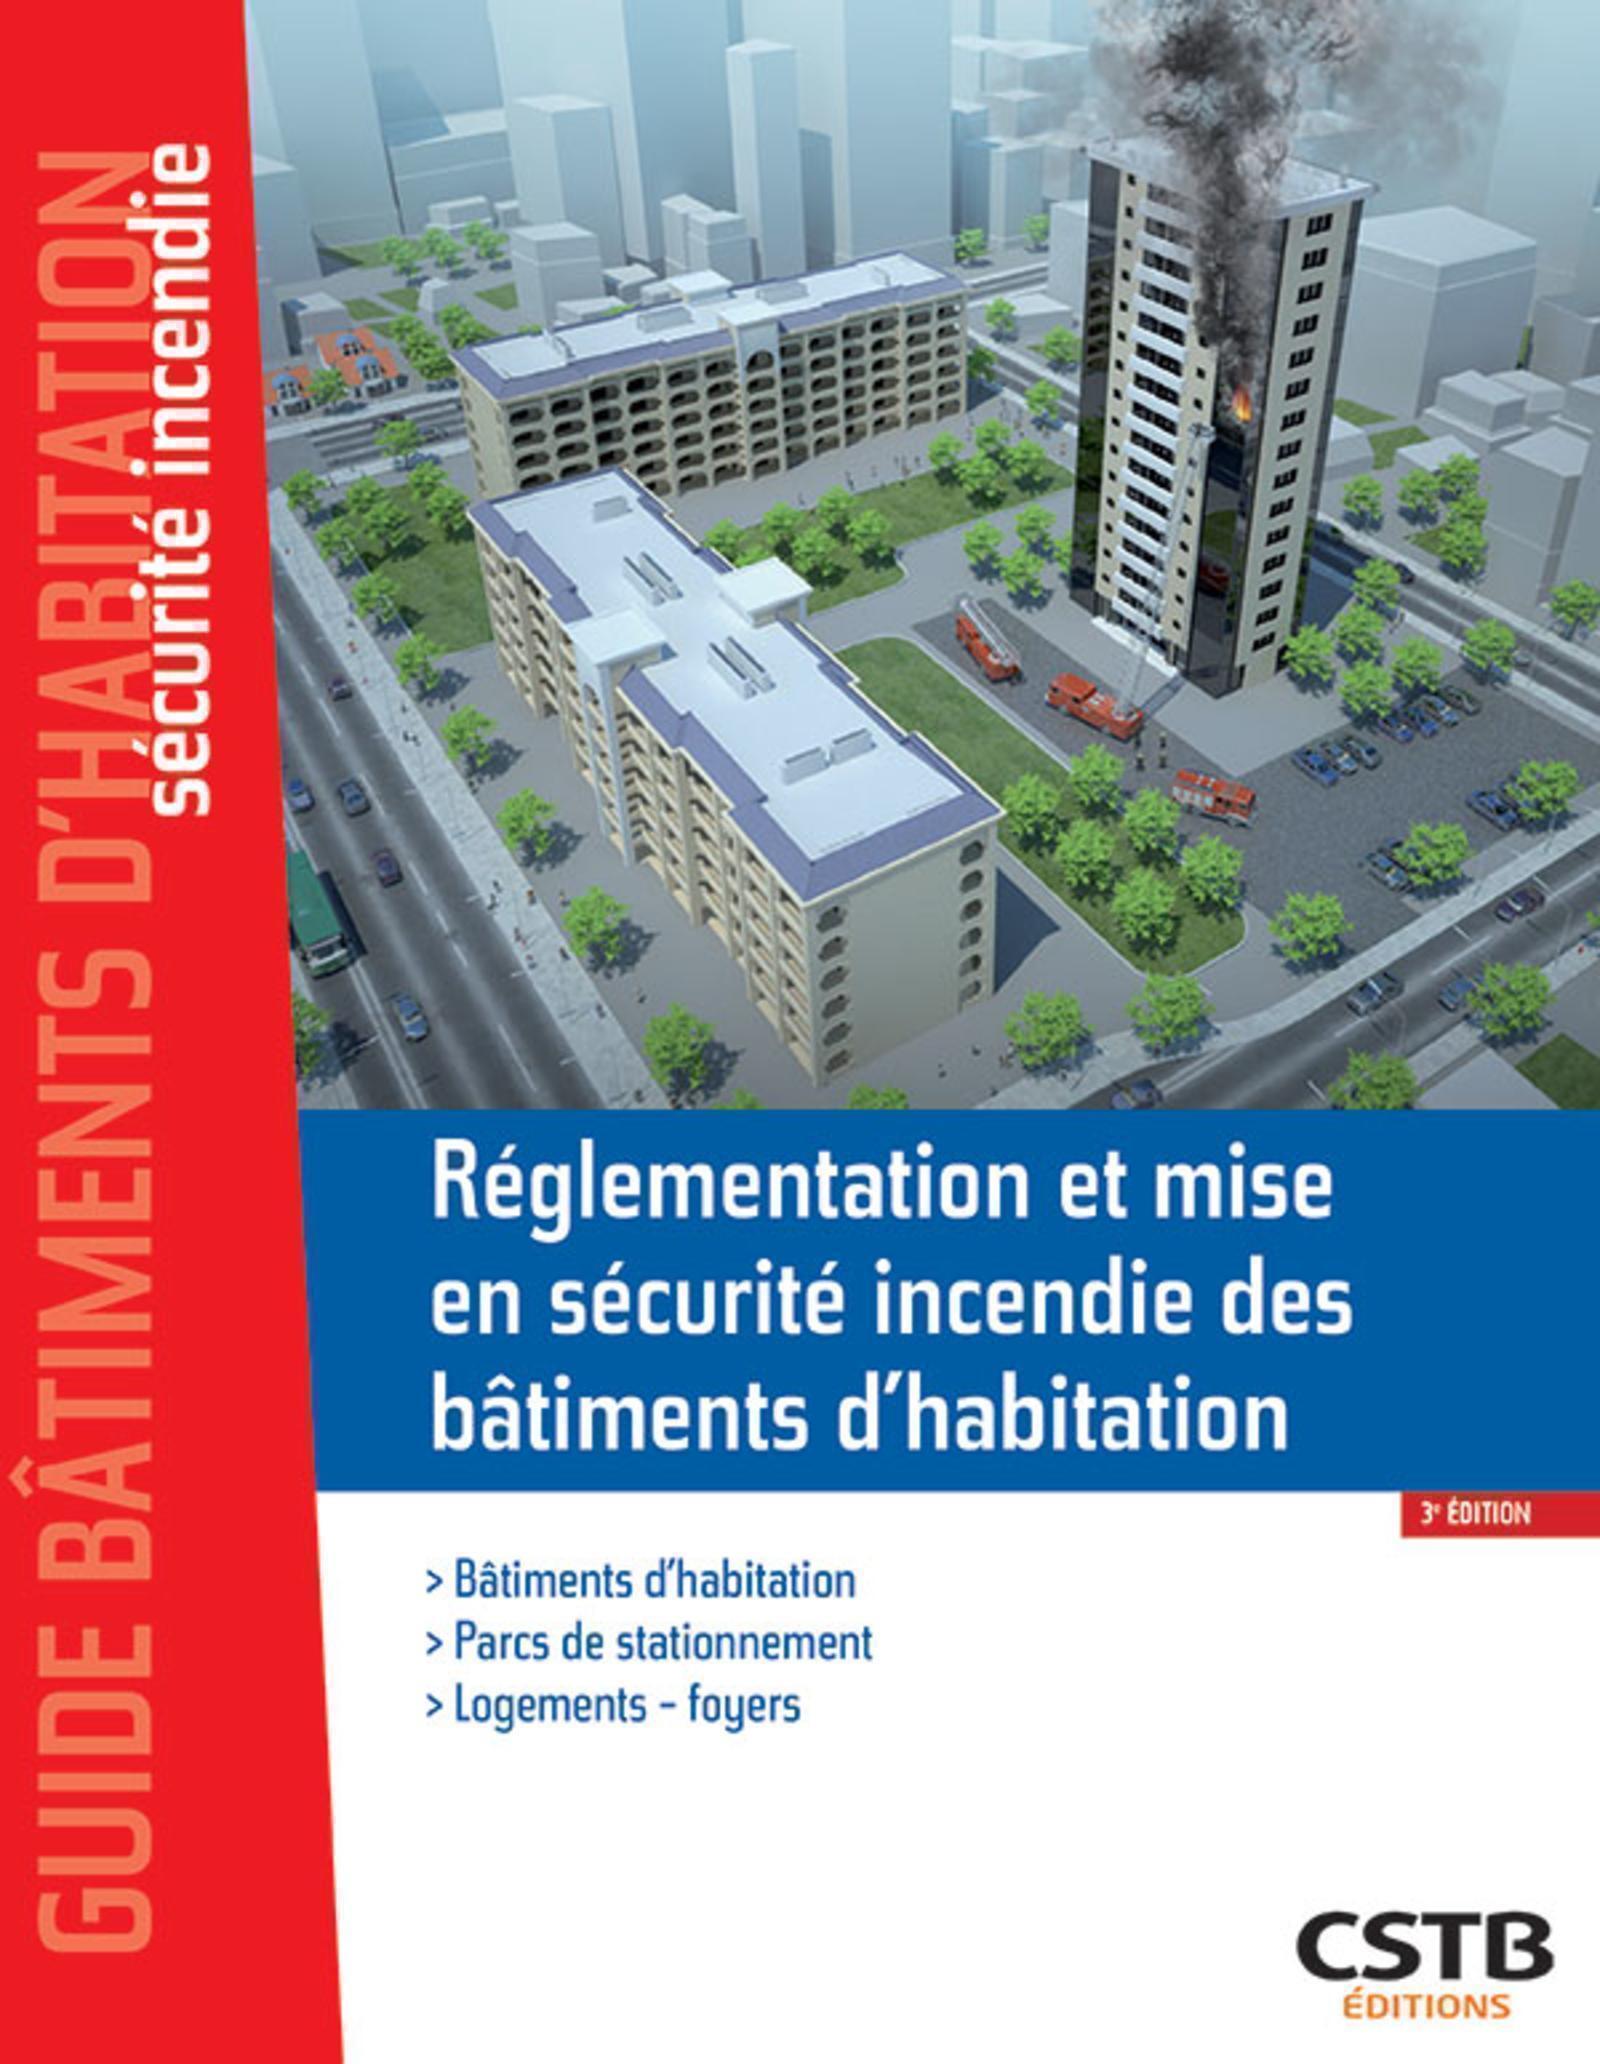 REGLEMENTATION ET MISE EN SECURITE INCENDIE DES BATIMENTS D'HABITATION - BATIMENTS D'HABITATION - PA